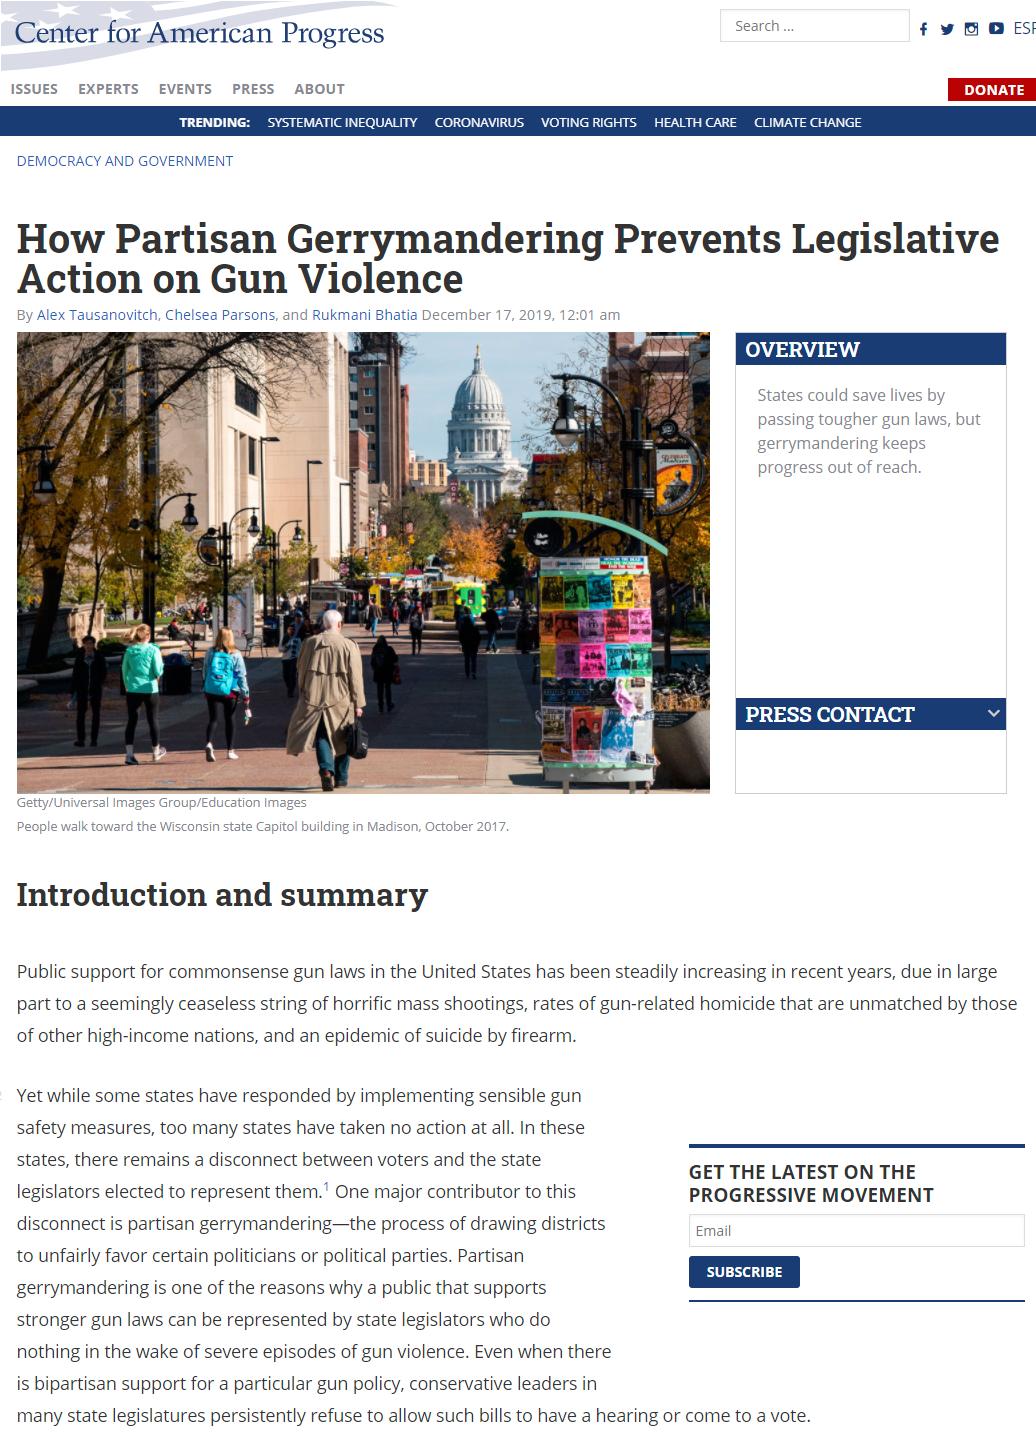 How Partisan Gerrymandering Prevents Legislative Action on Gun Violence